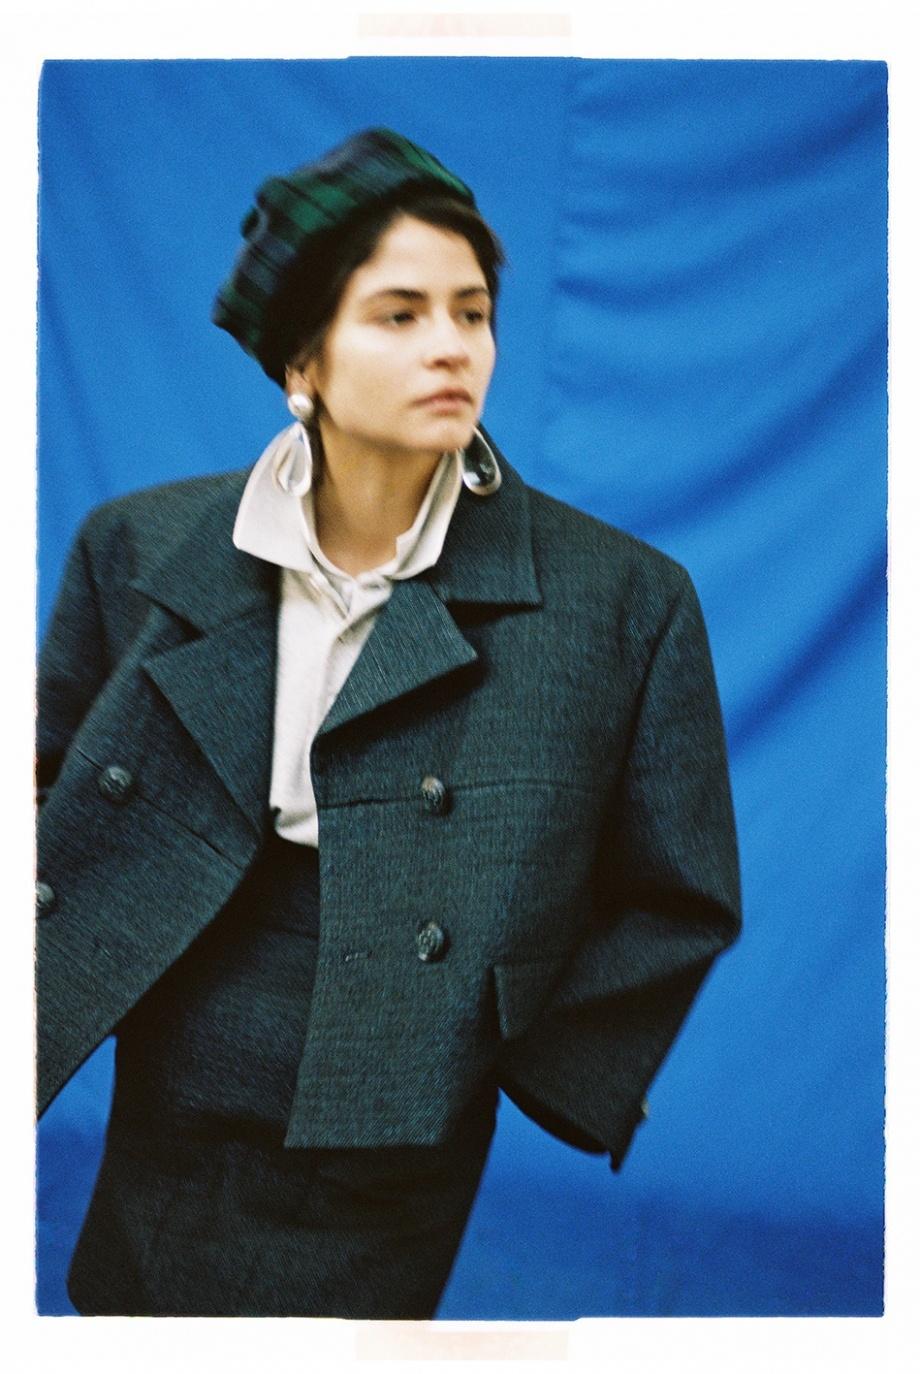 Vogue雜志葡萄牙版2018年四月刊時尚大片攝影師Branislav Simoncik攝影